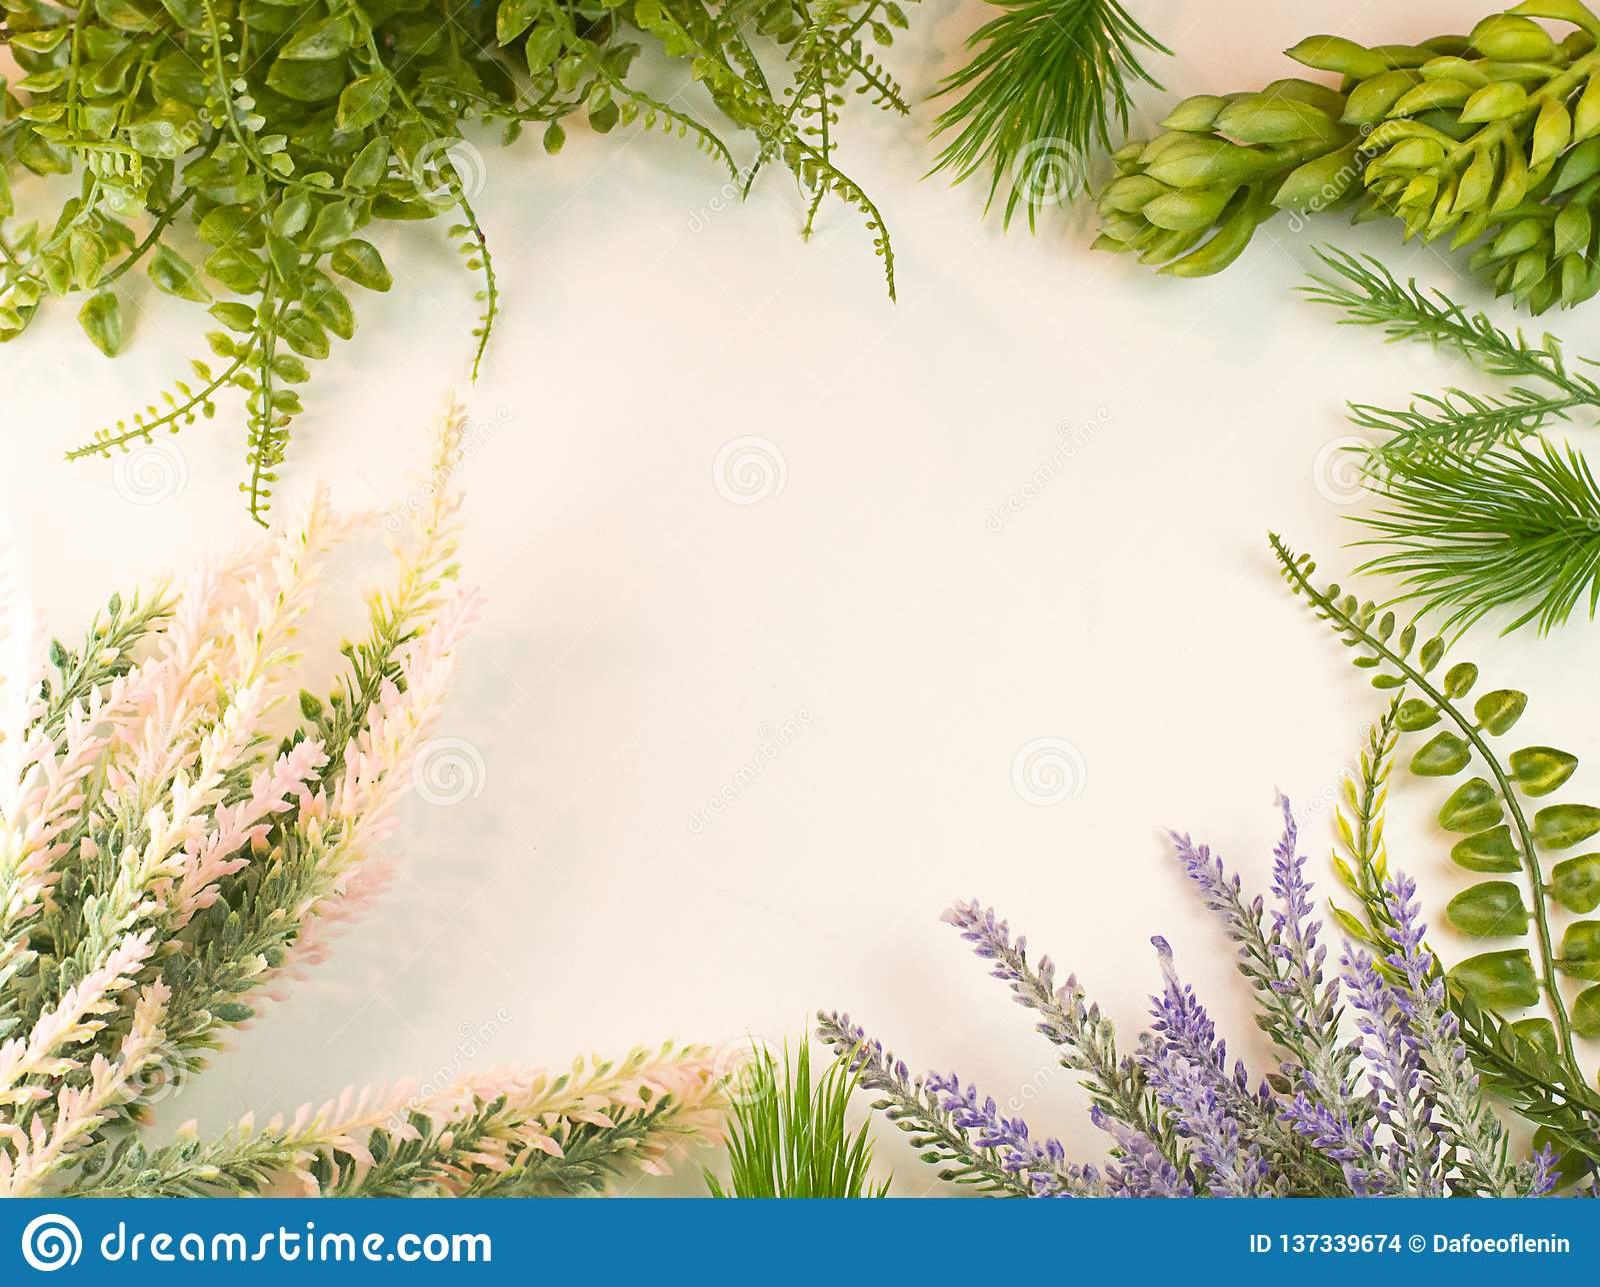 Plant Cluster Succulent Garden Green Border Stock Photo Image Of